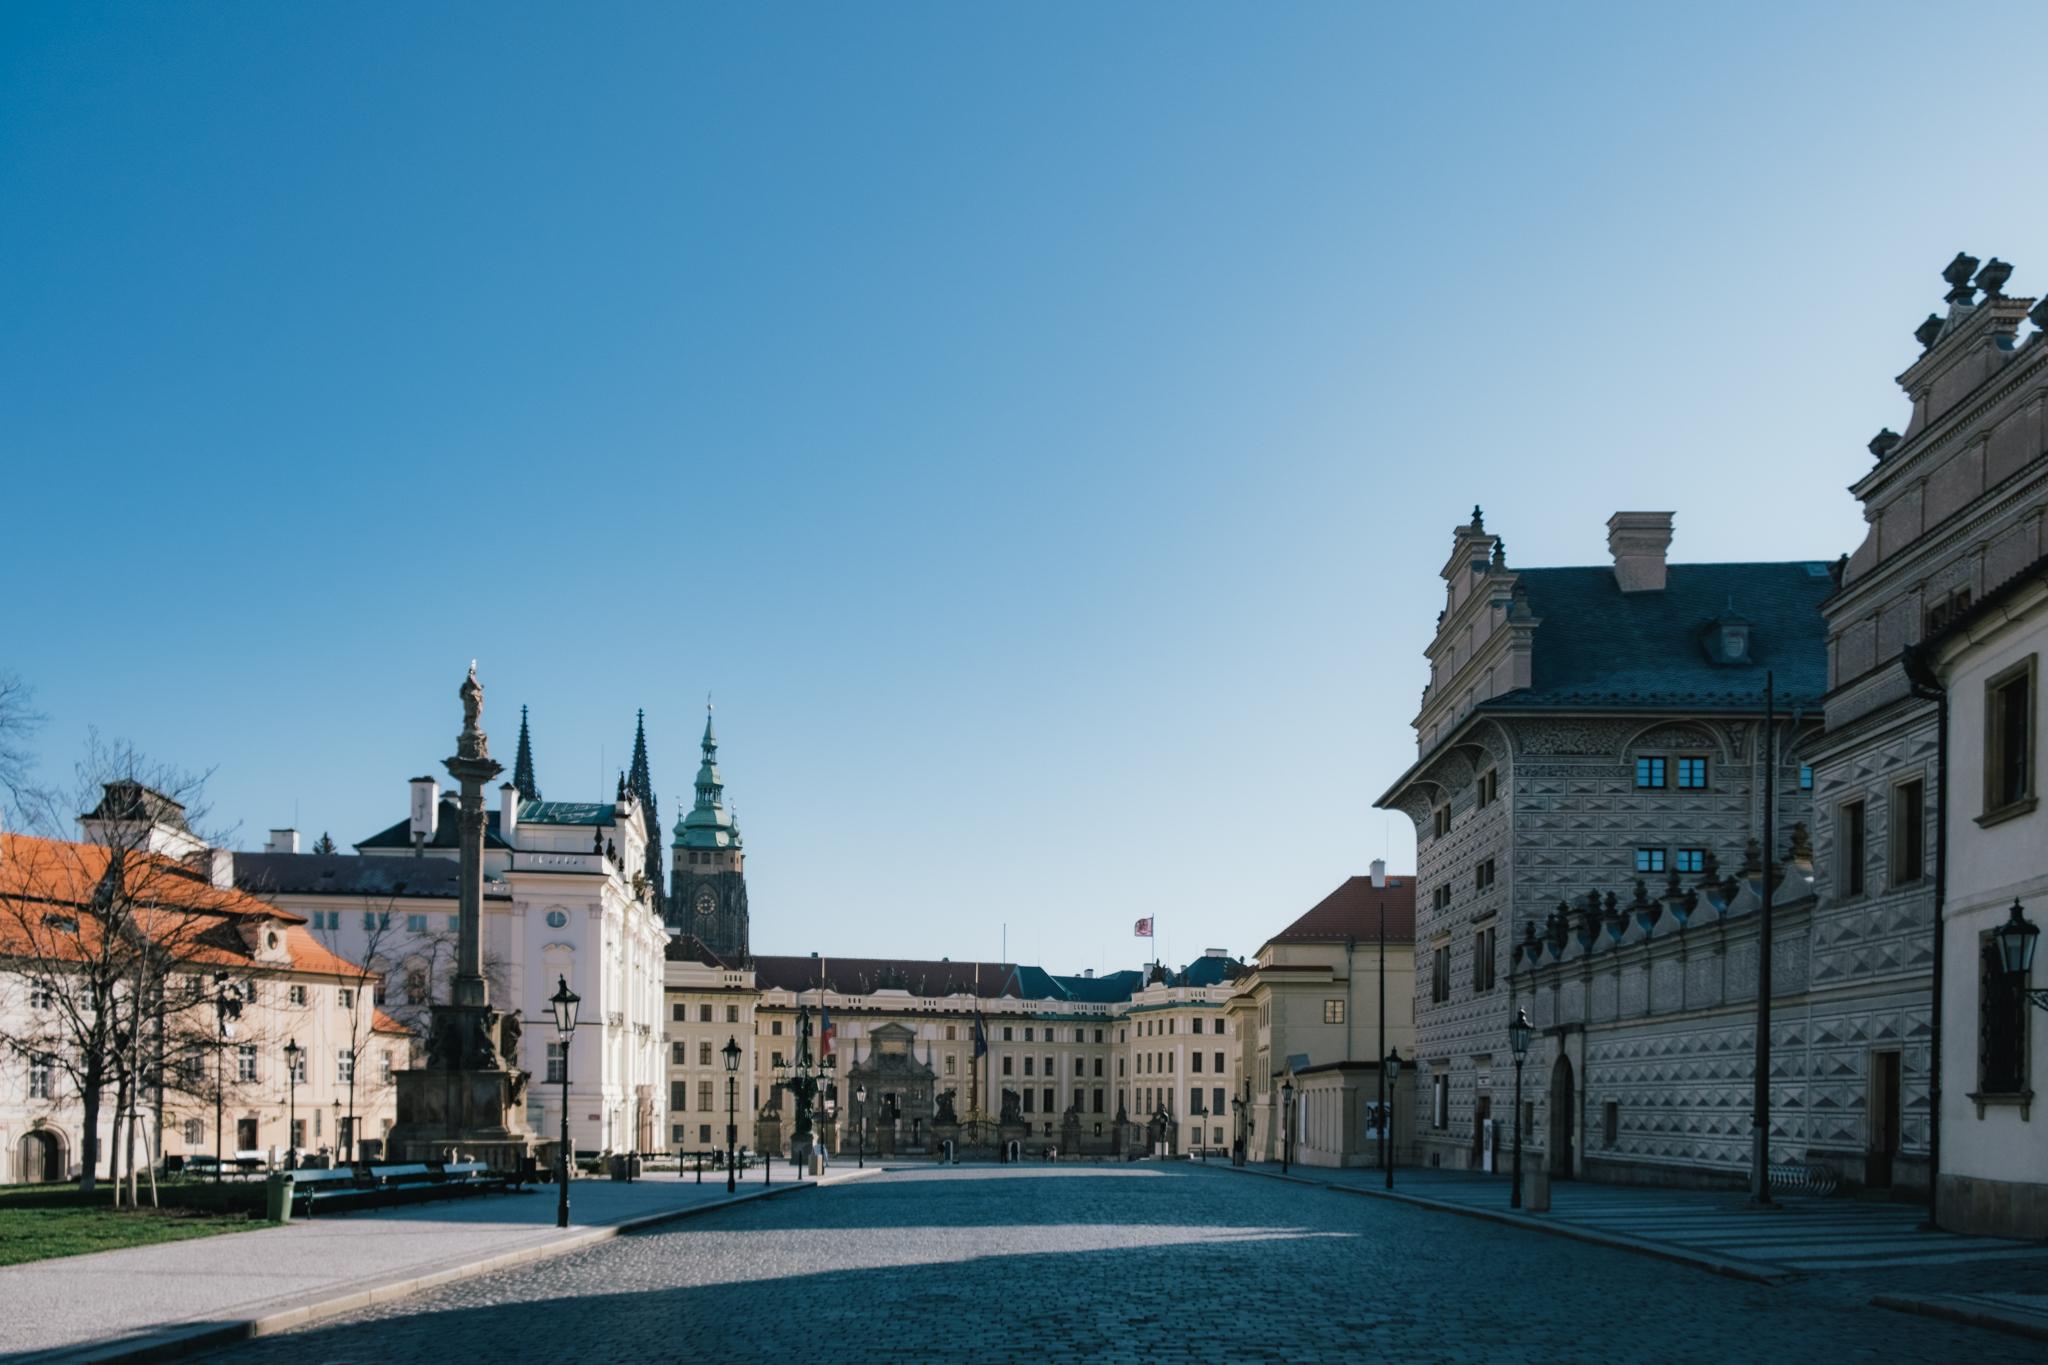 Prague Castle Square (Pražský hrad) without the crowds